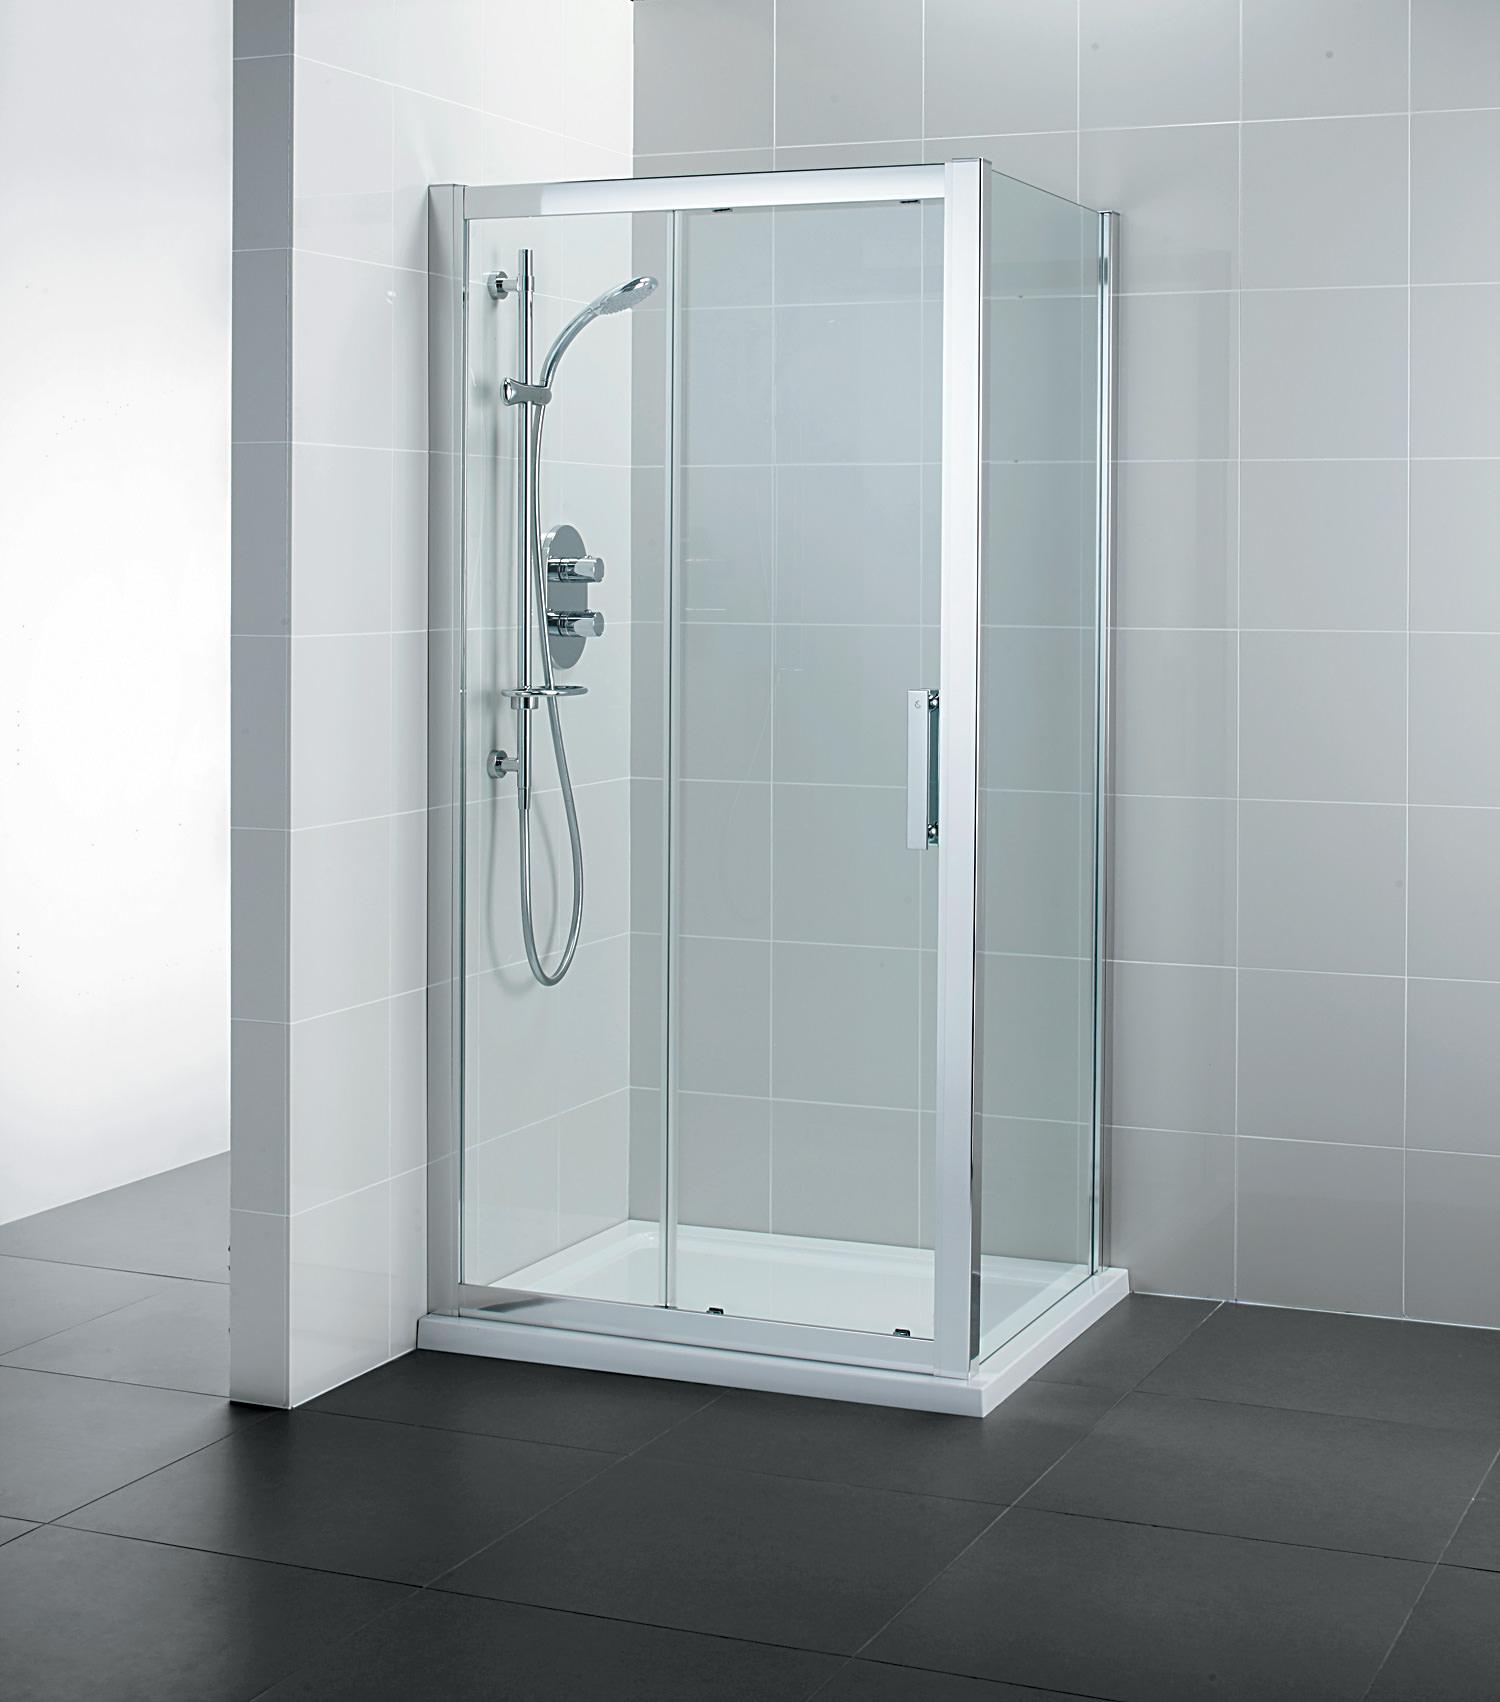 Ideal standard synergy sliding shower door 1200mm for 1200mm shower door